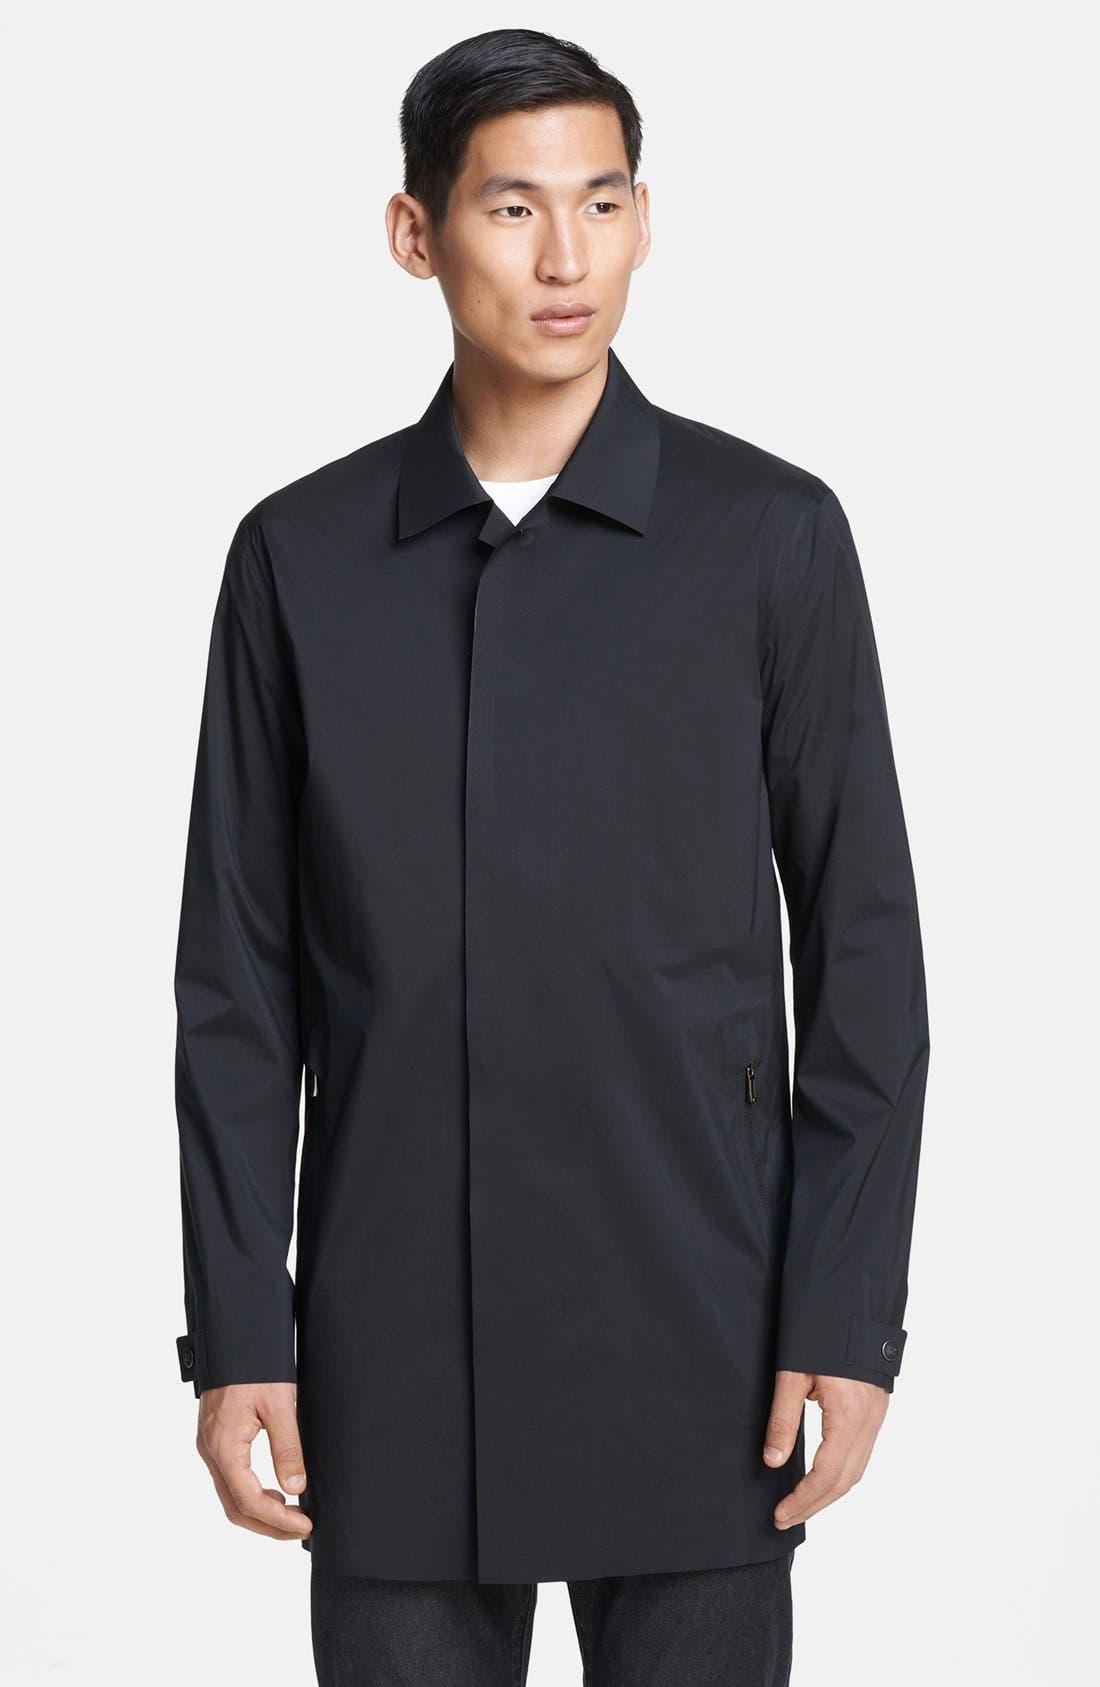 Alternate Image 1 Selected - Zegna Sport Packable Water Repellent Raincoat